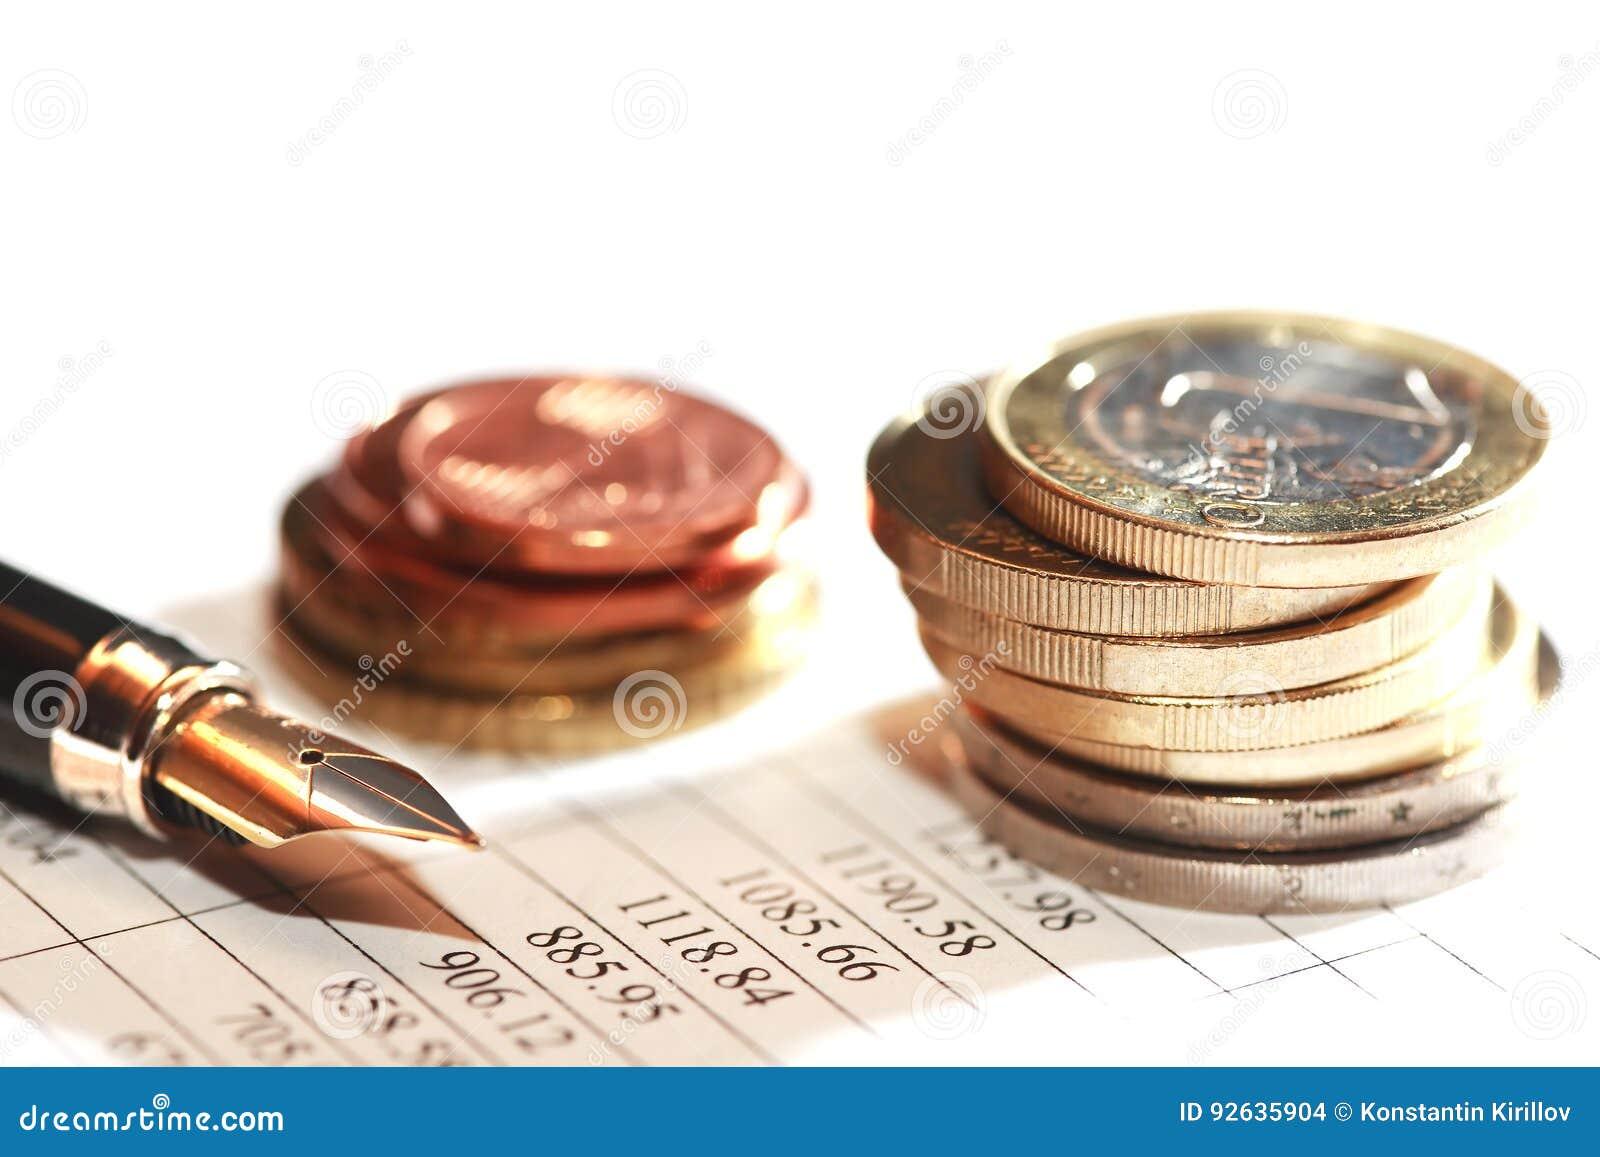 Cash coins near me apparel : C20 coin hitbtc job